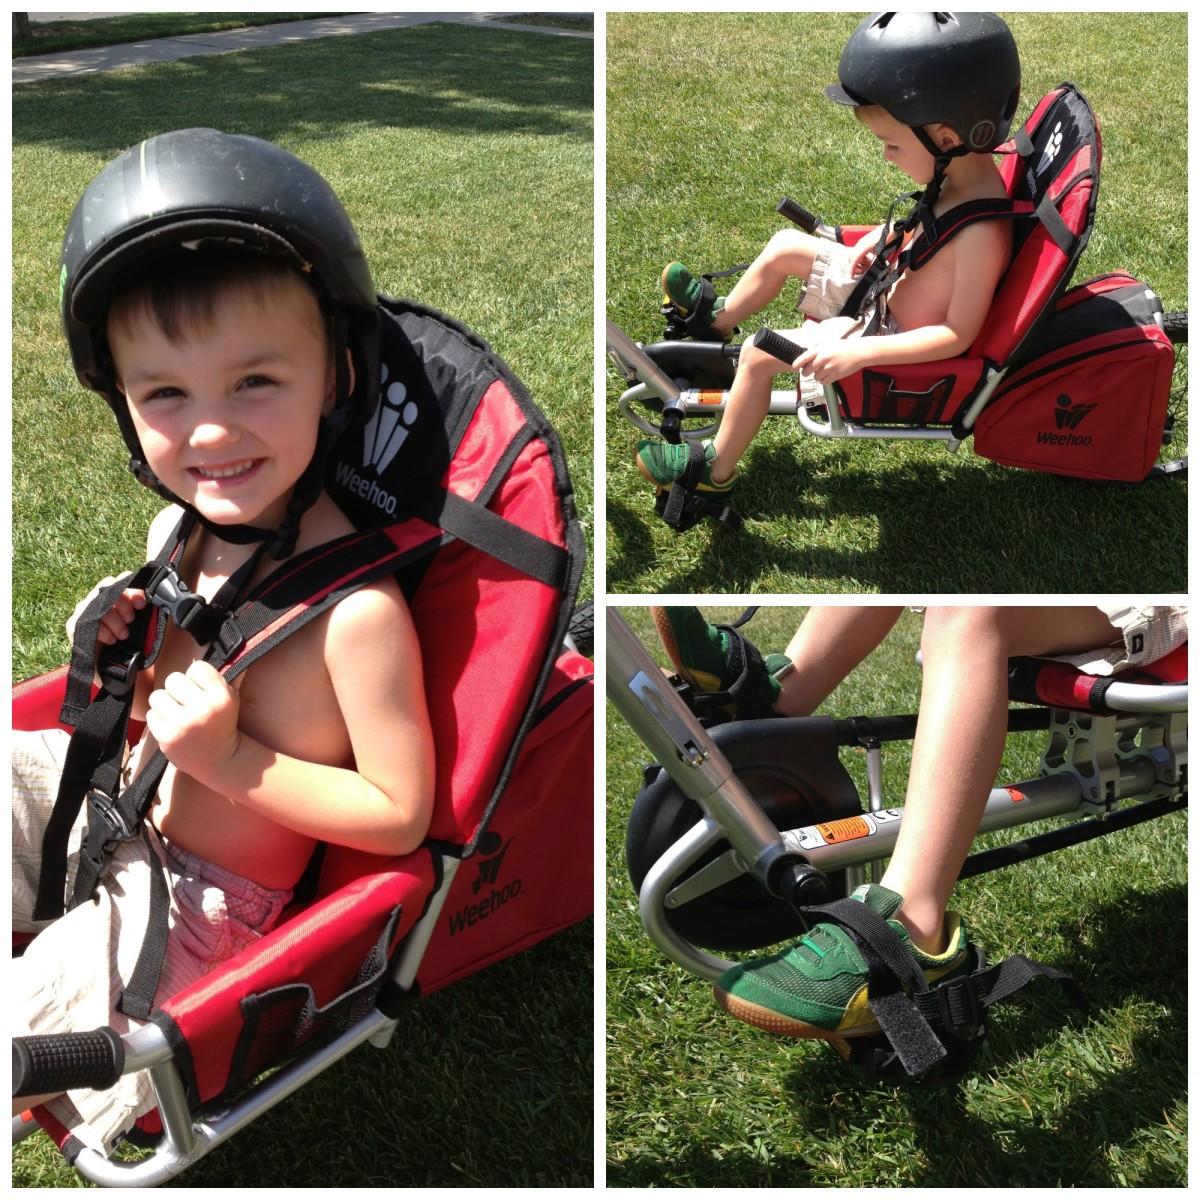 Weehoo Bike trailer for kids